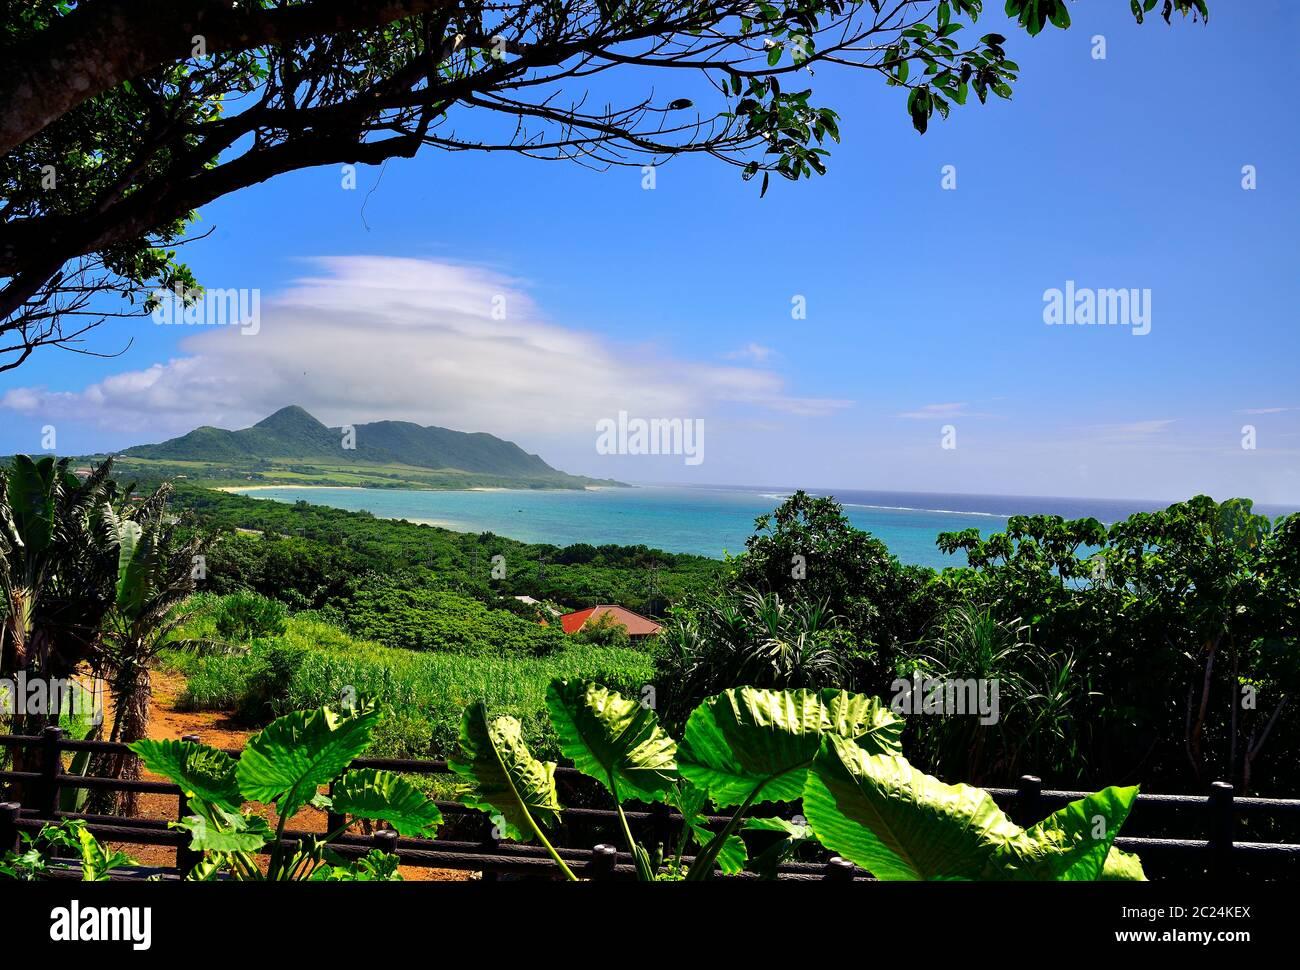 Vista, da Tamatorizak, Ishigaki, Isole Yahema, Okinawa, Giappone Foto Stock